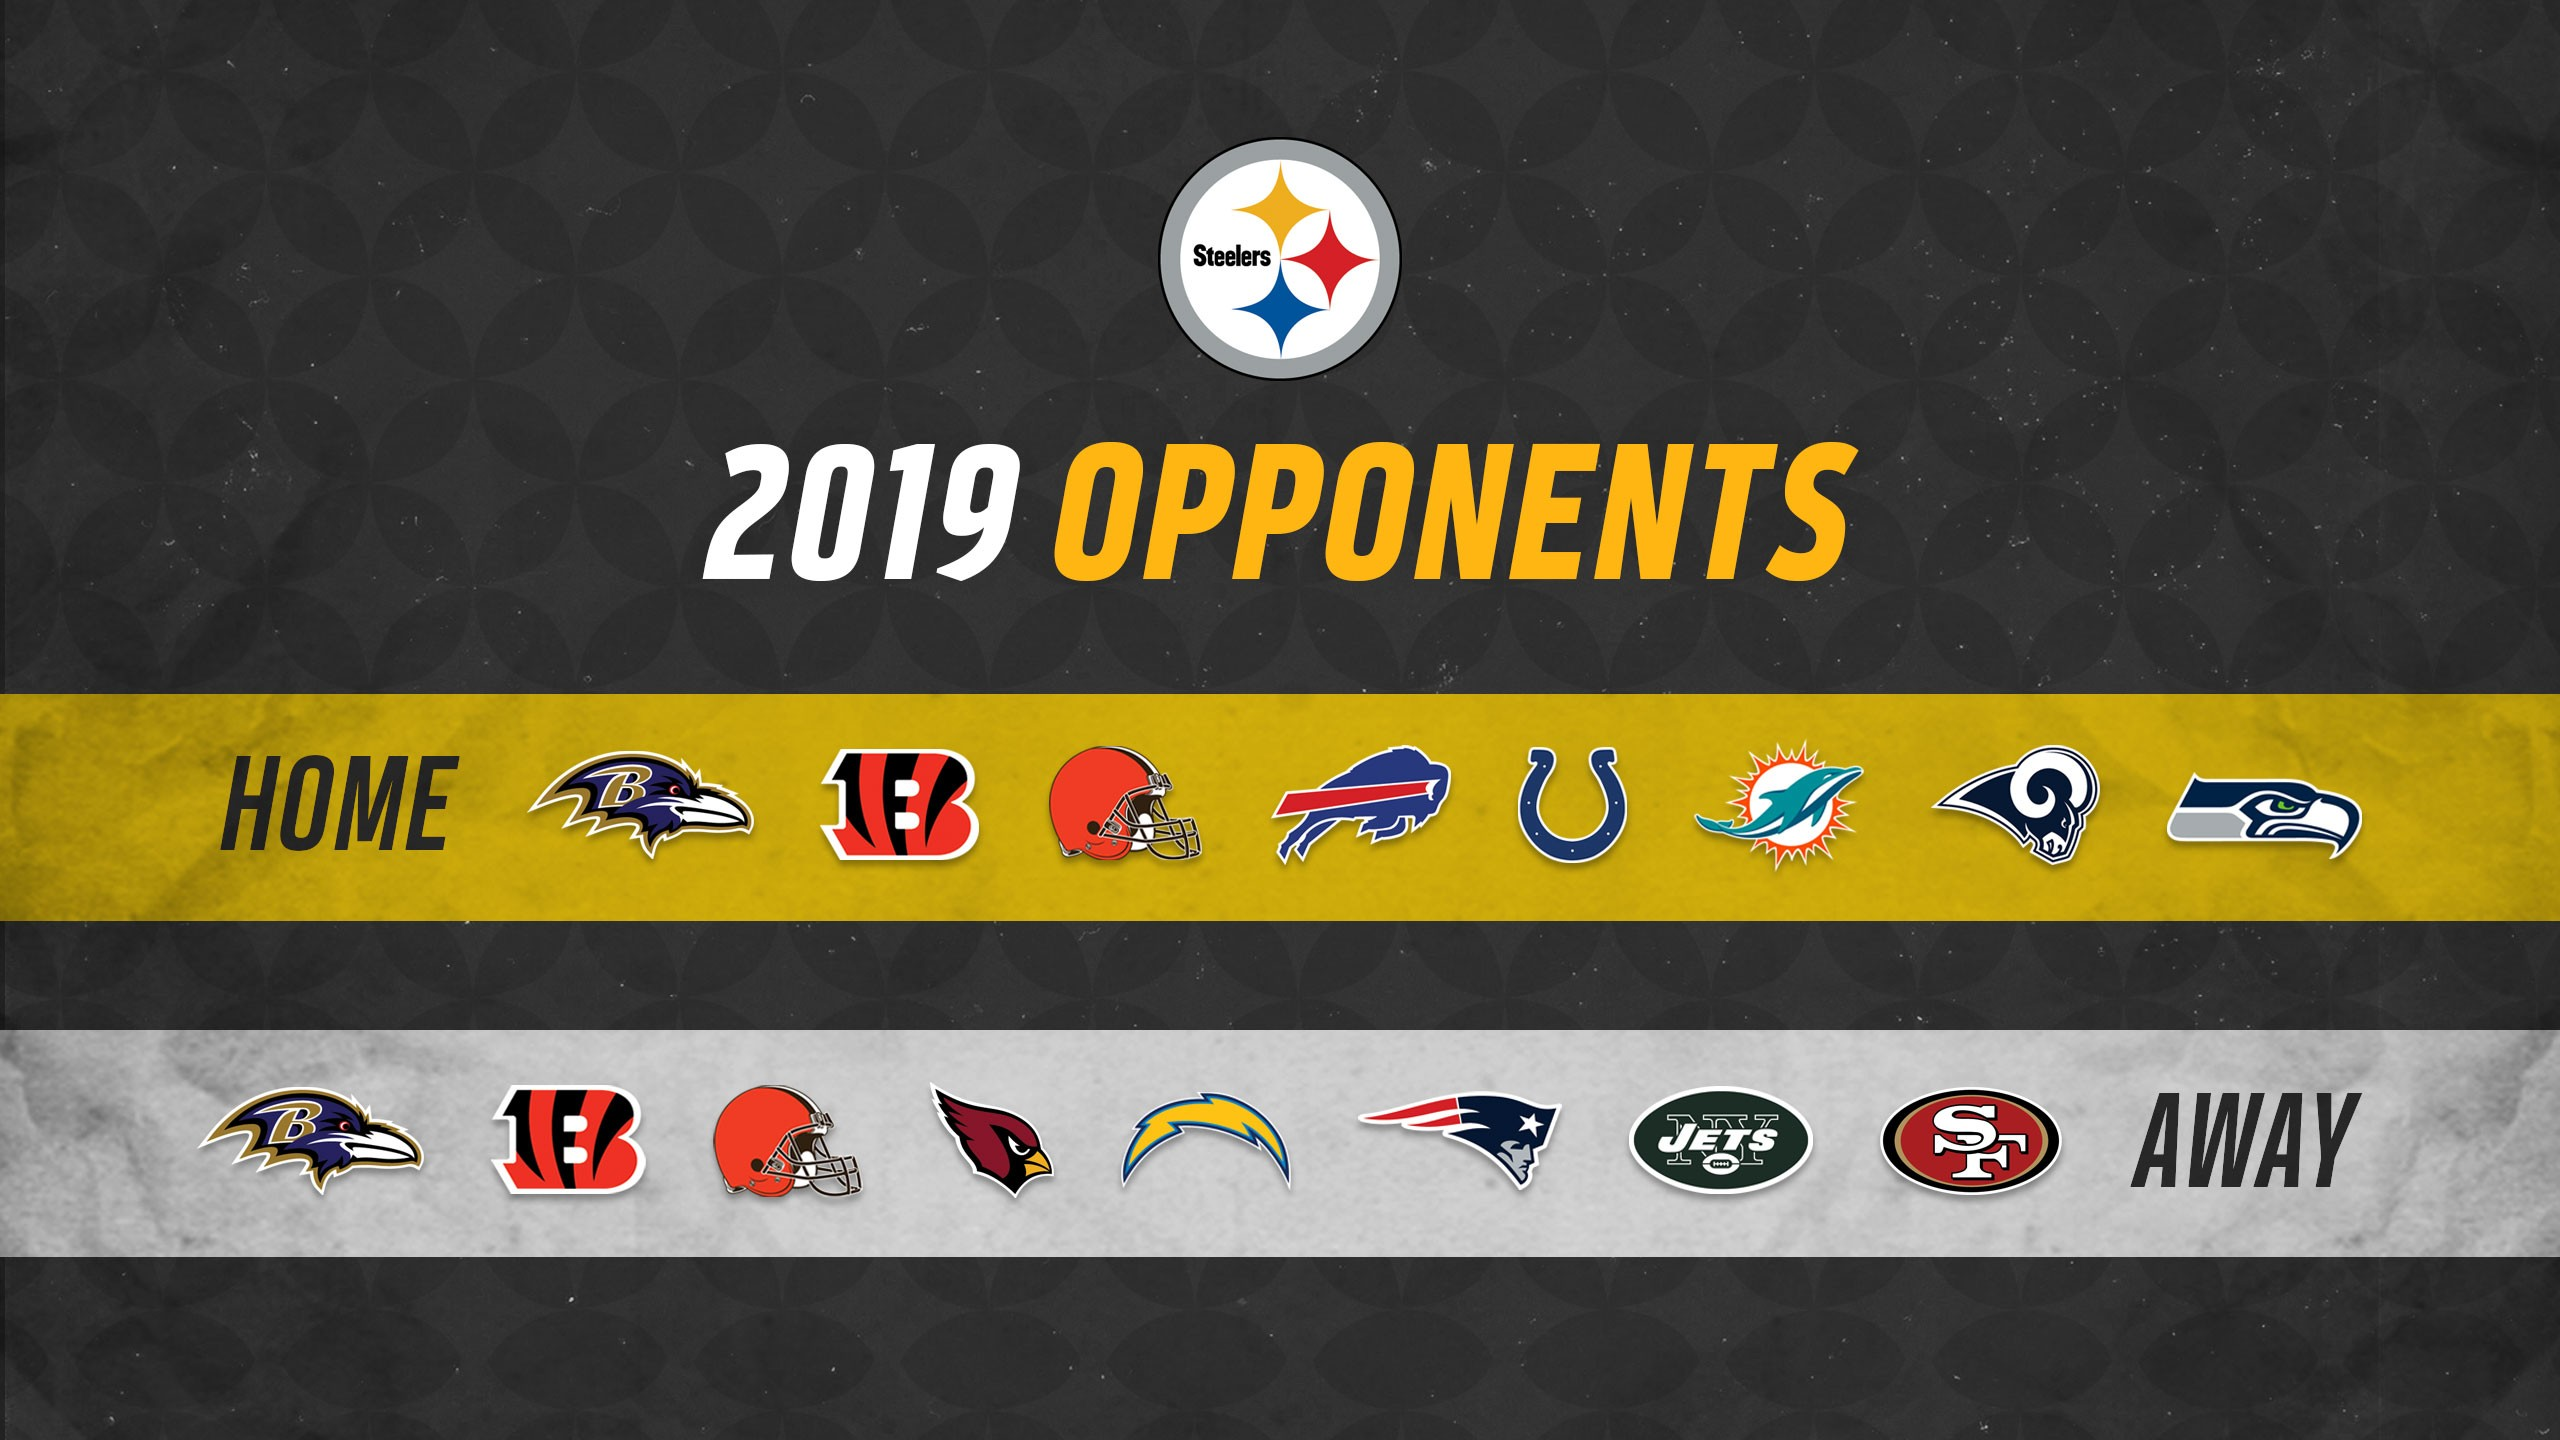 March 1 2019 Calendar Actual Steelers Home